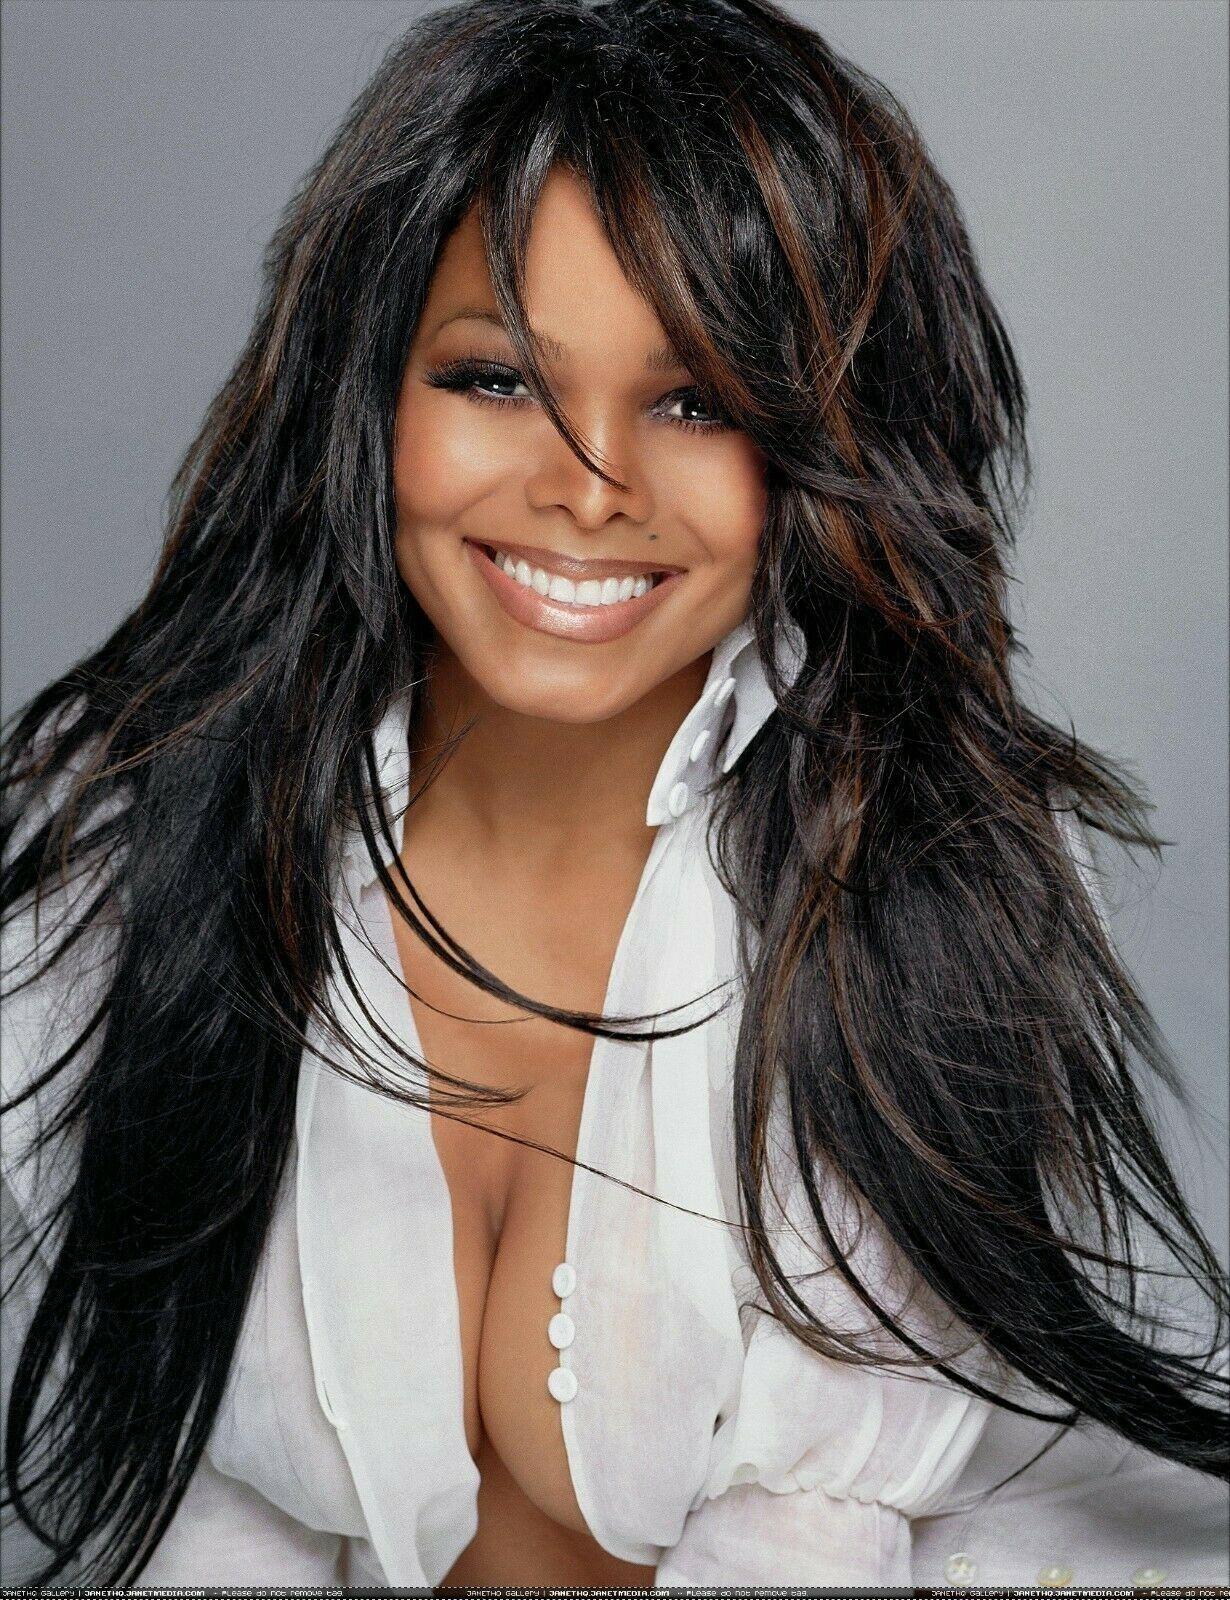 Pin By Jumpin Jbarry On Beautiful In 2020 Janet Jackson Hair Styles Beautiful Black Women